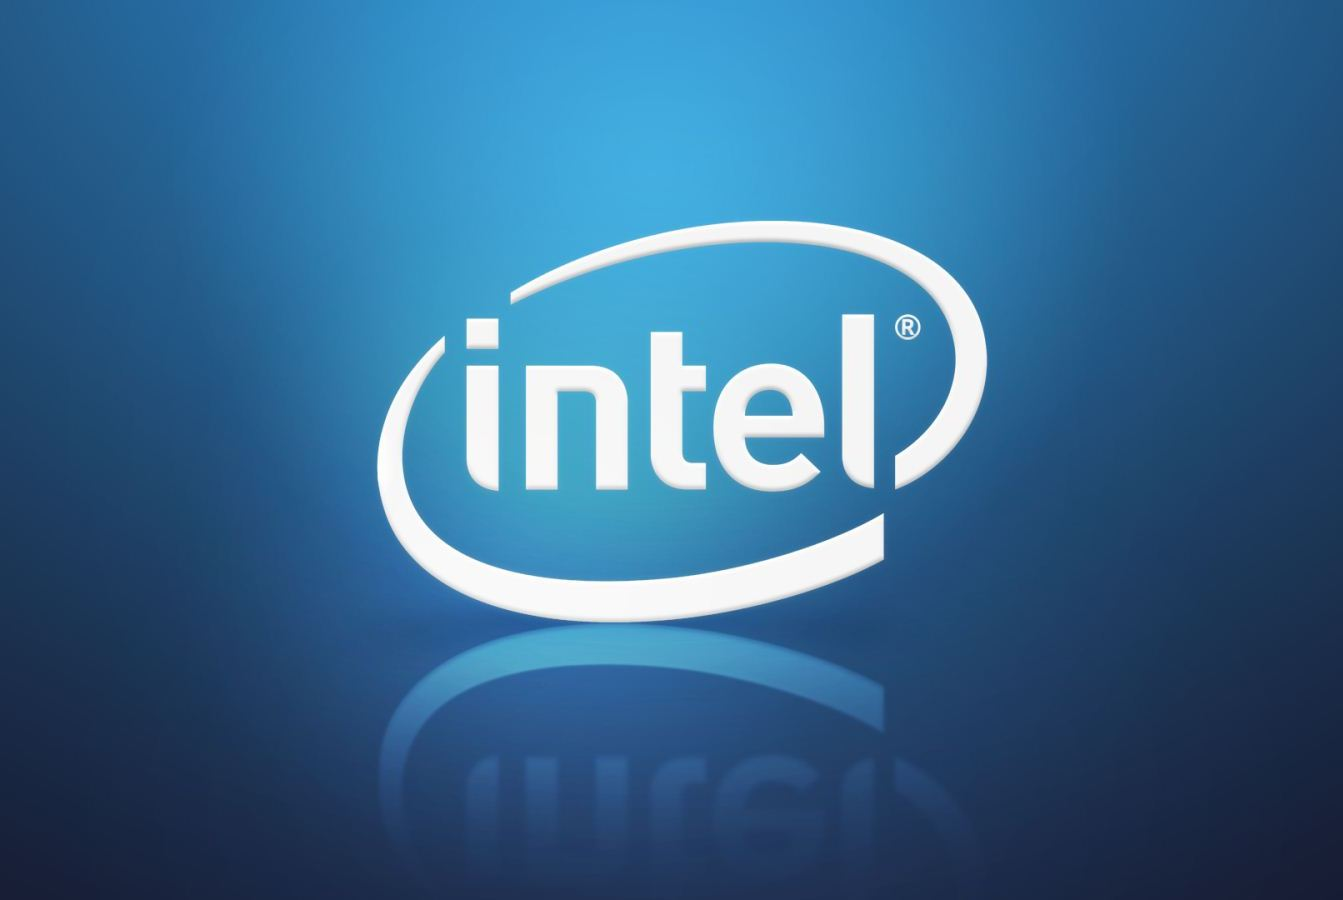 intel无语!最强CPU竟买不到主板!网友:有钱不让花系列